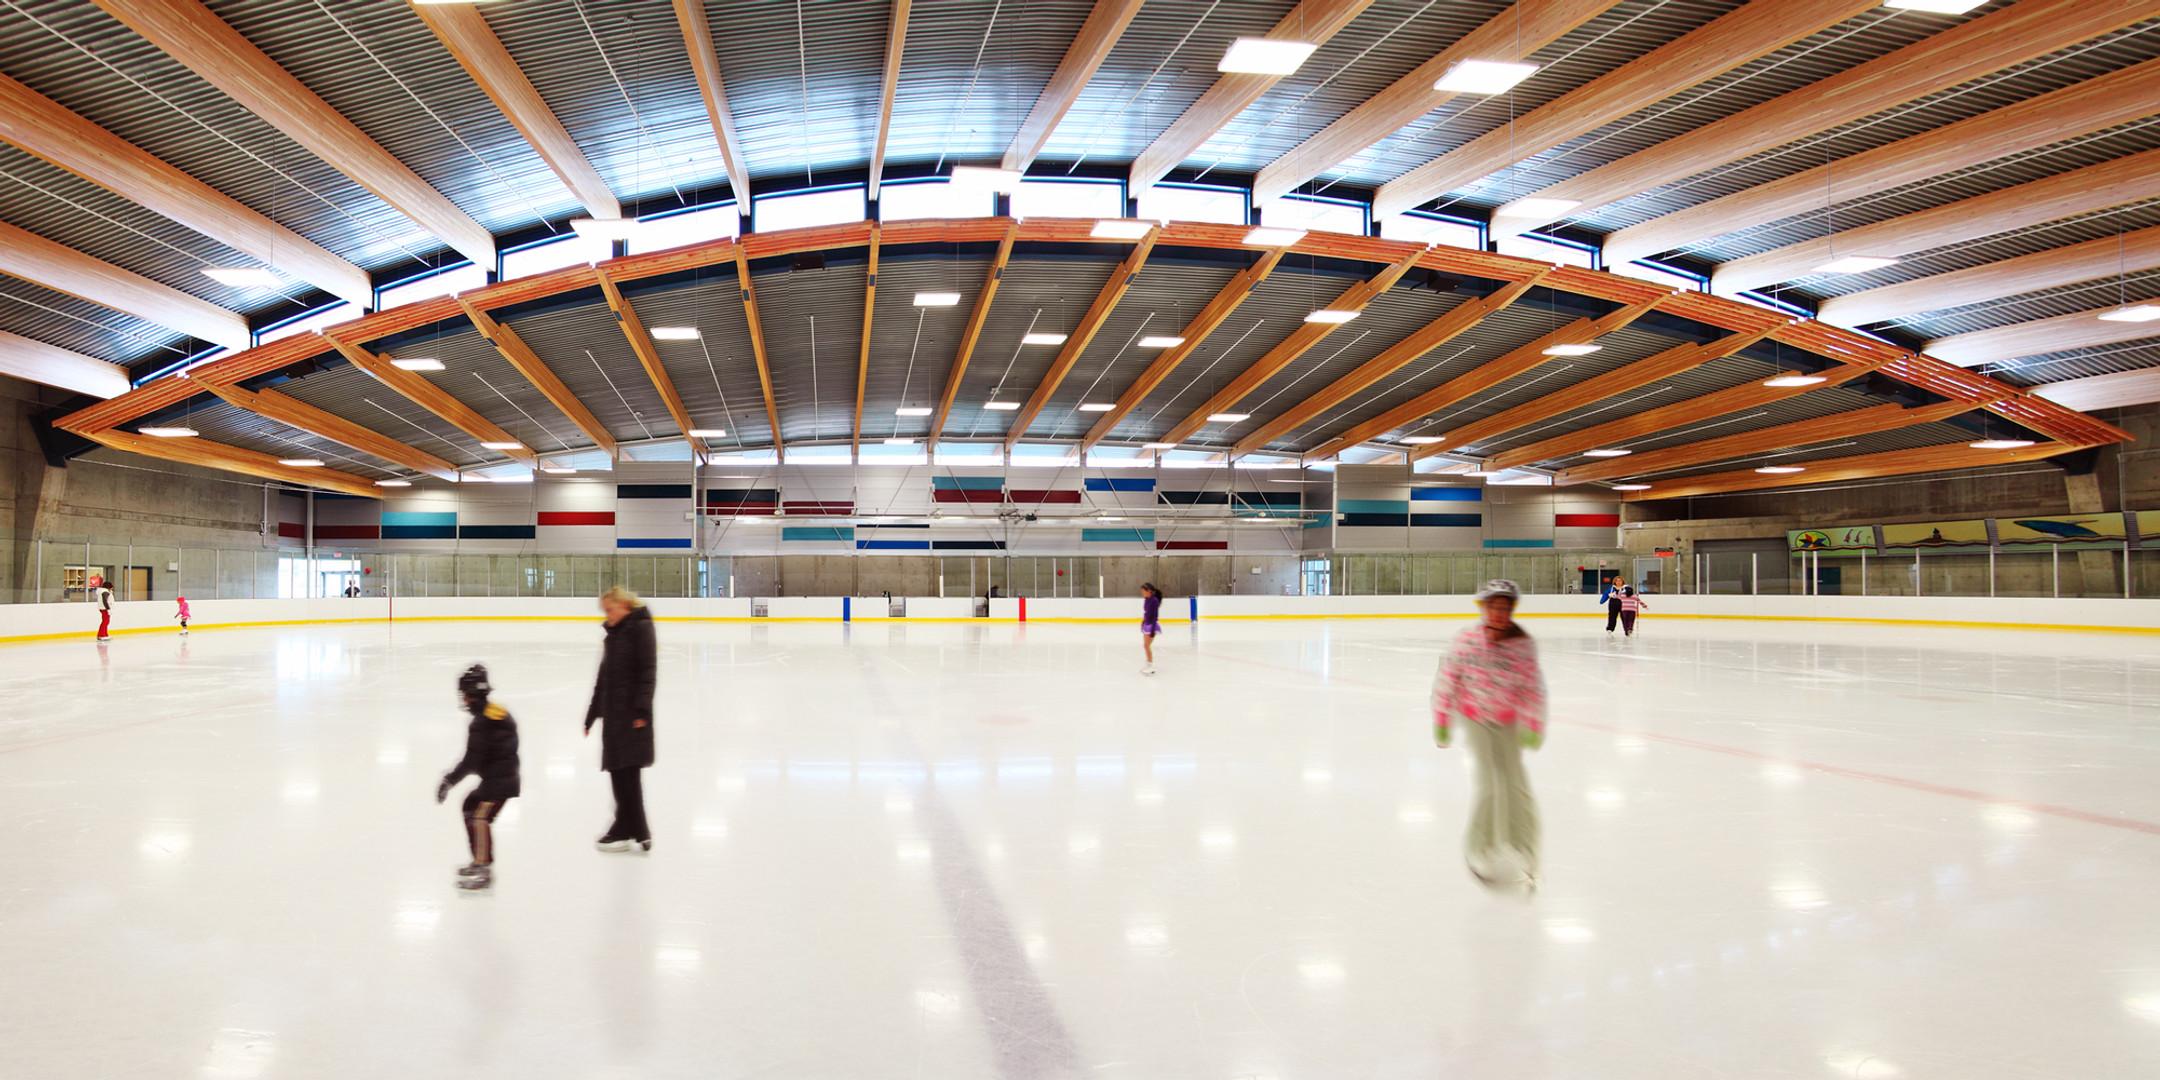 5_Trout-Lake-Ice-Rink.jpg